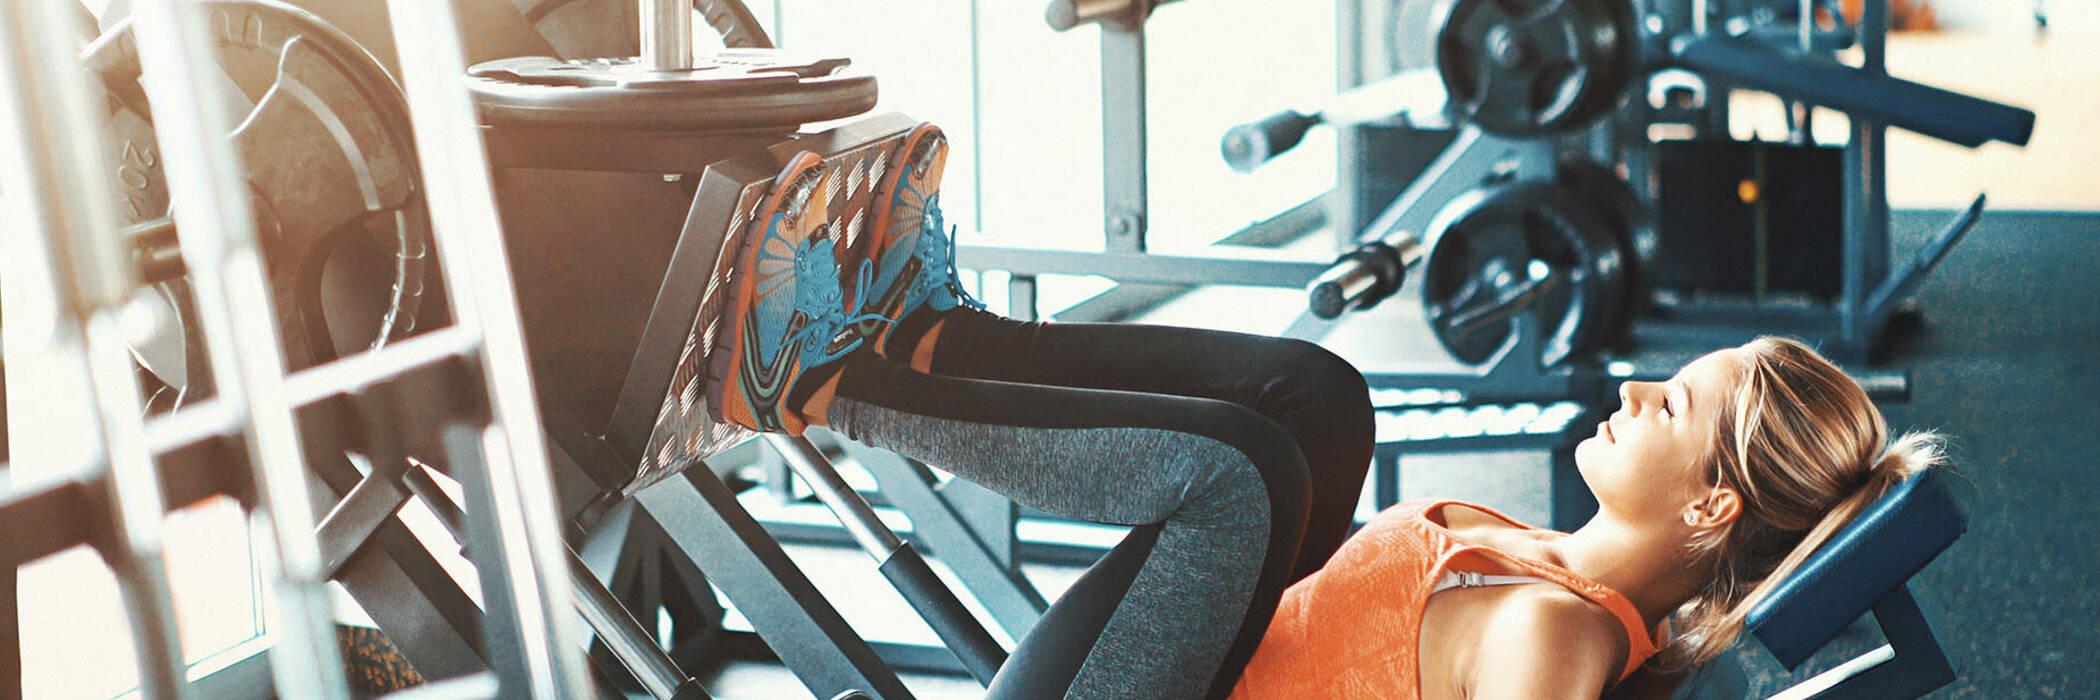 Woman using leg press machine at gym